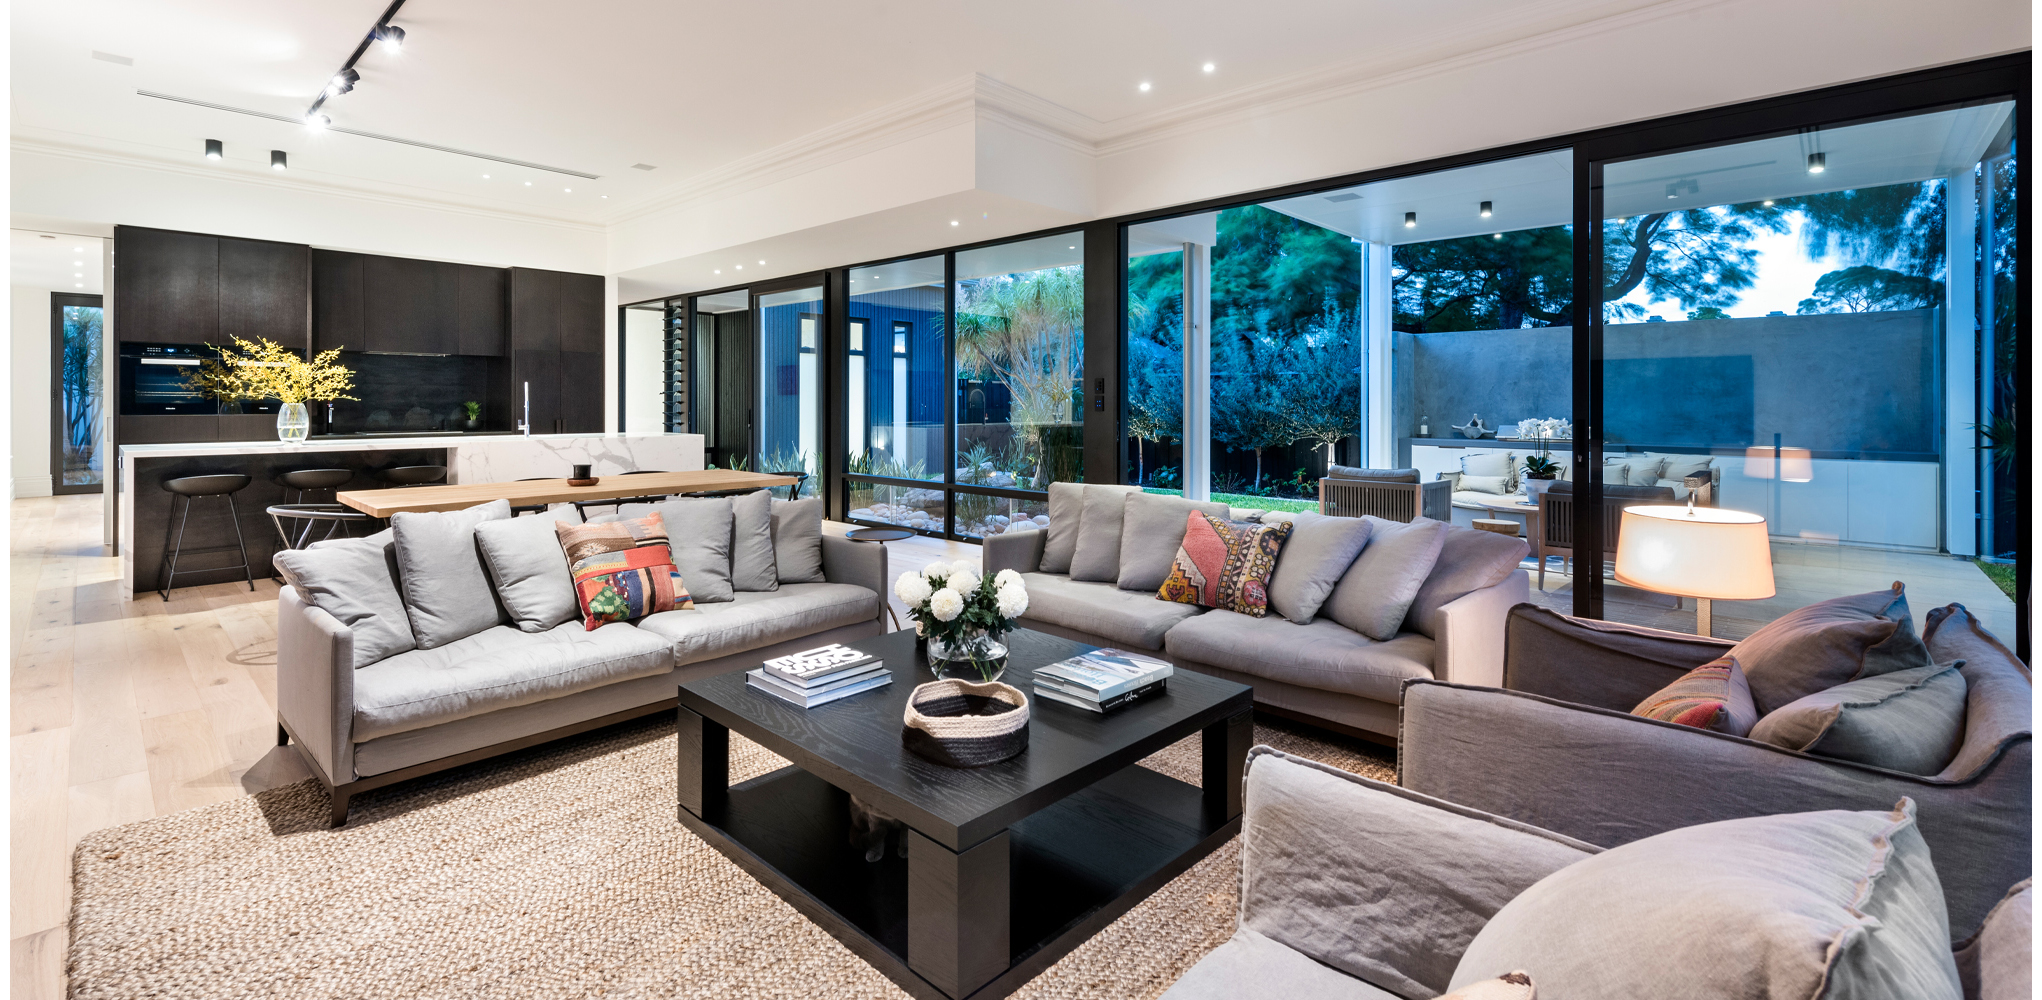 maek-luxury-home-design-inspiration-mosmanpark-27m-gallery-7.jpg